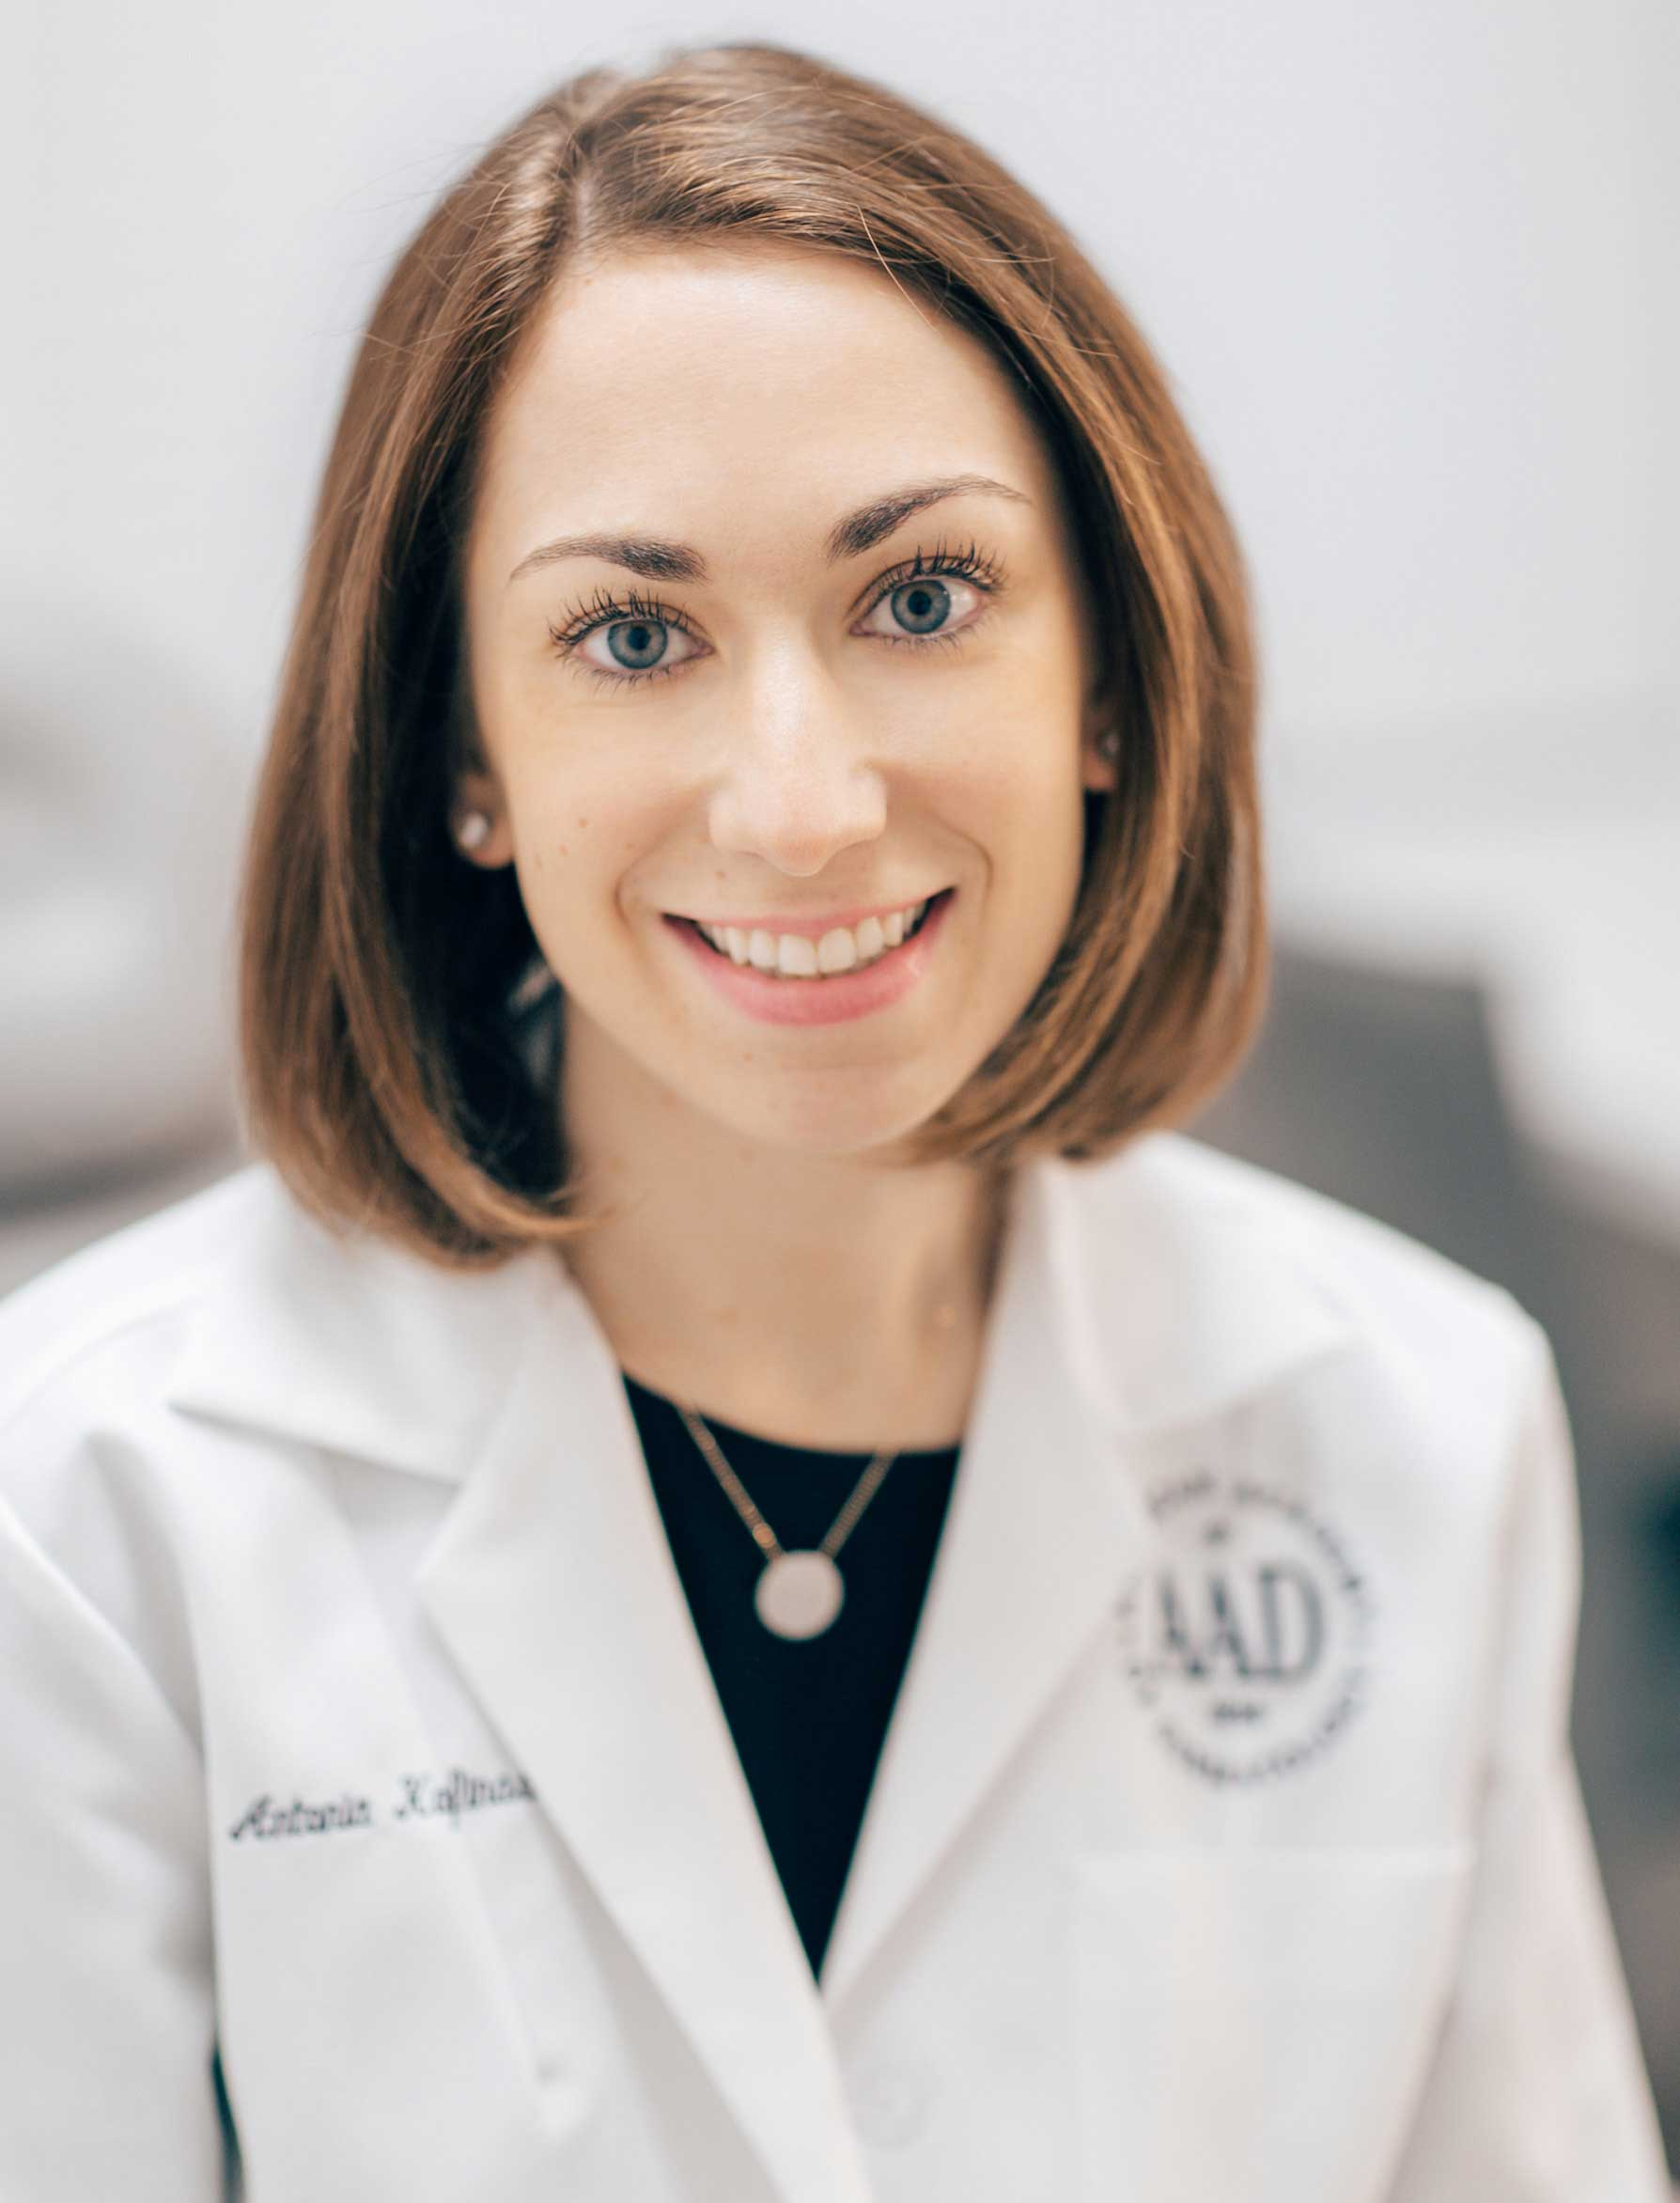 dr-antonia-kofinas-md